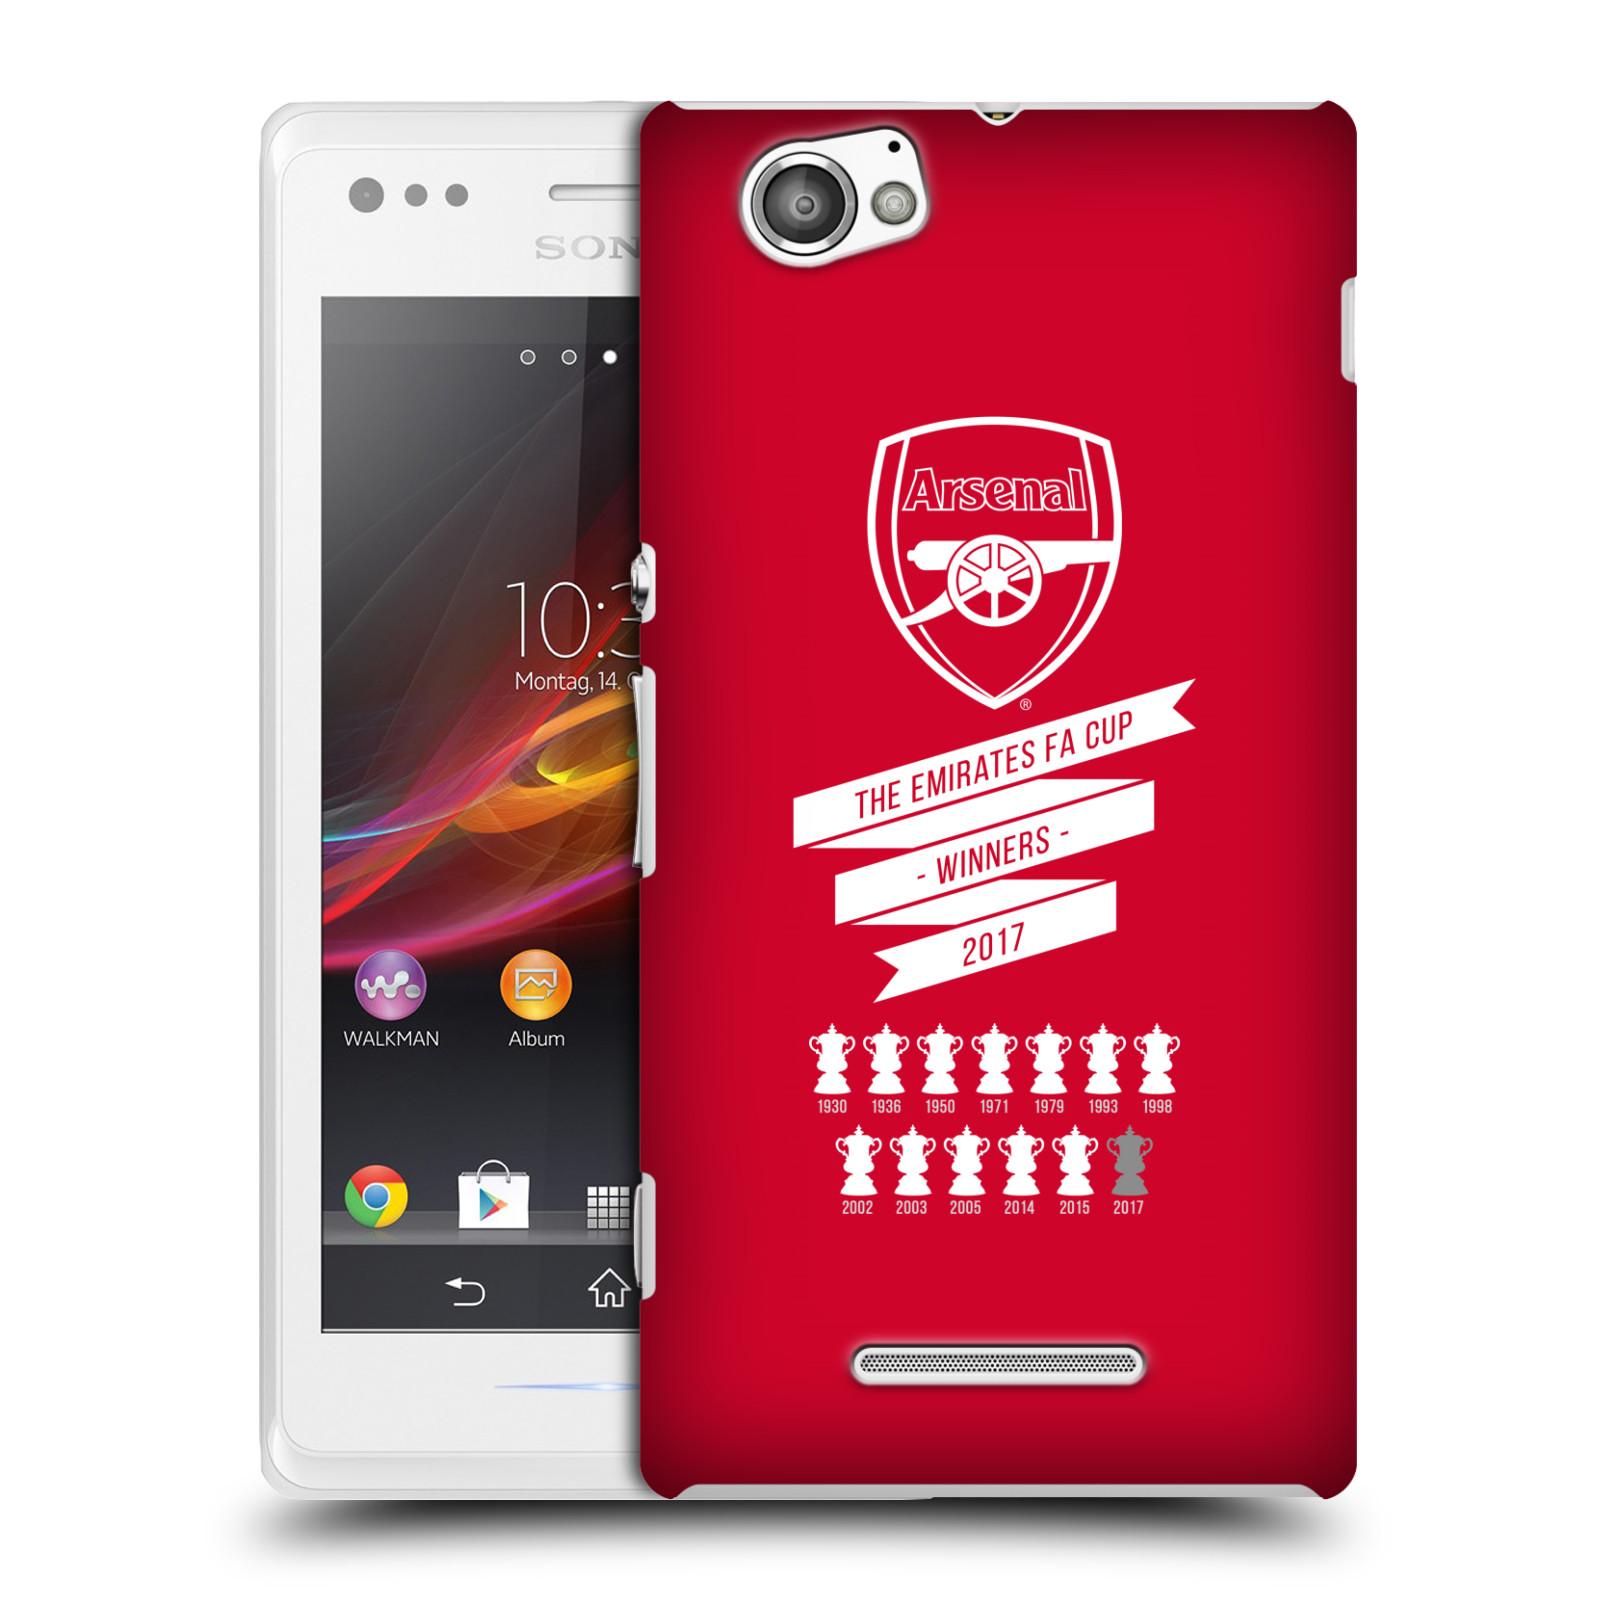 Plastové pouzdro na mobil Sony Xperia M C1905 - Head Case - Arsenal FC - 13 Wins